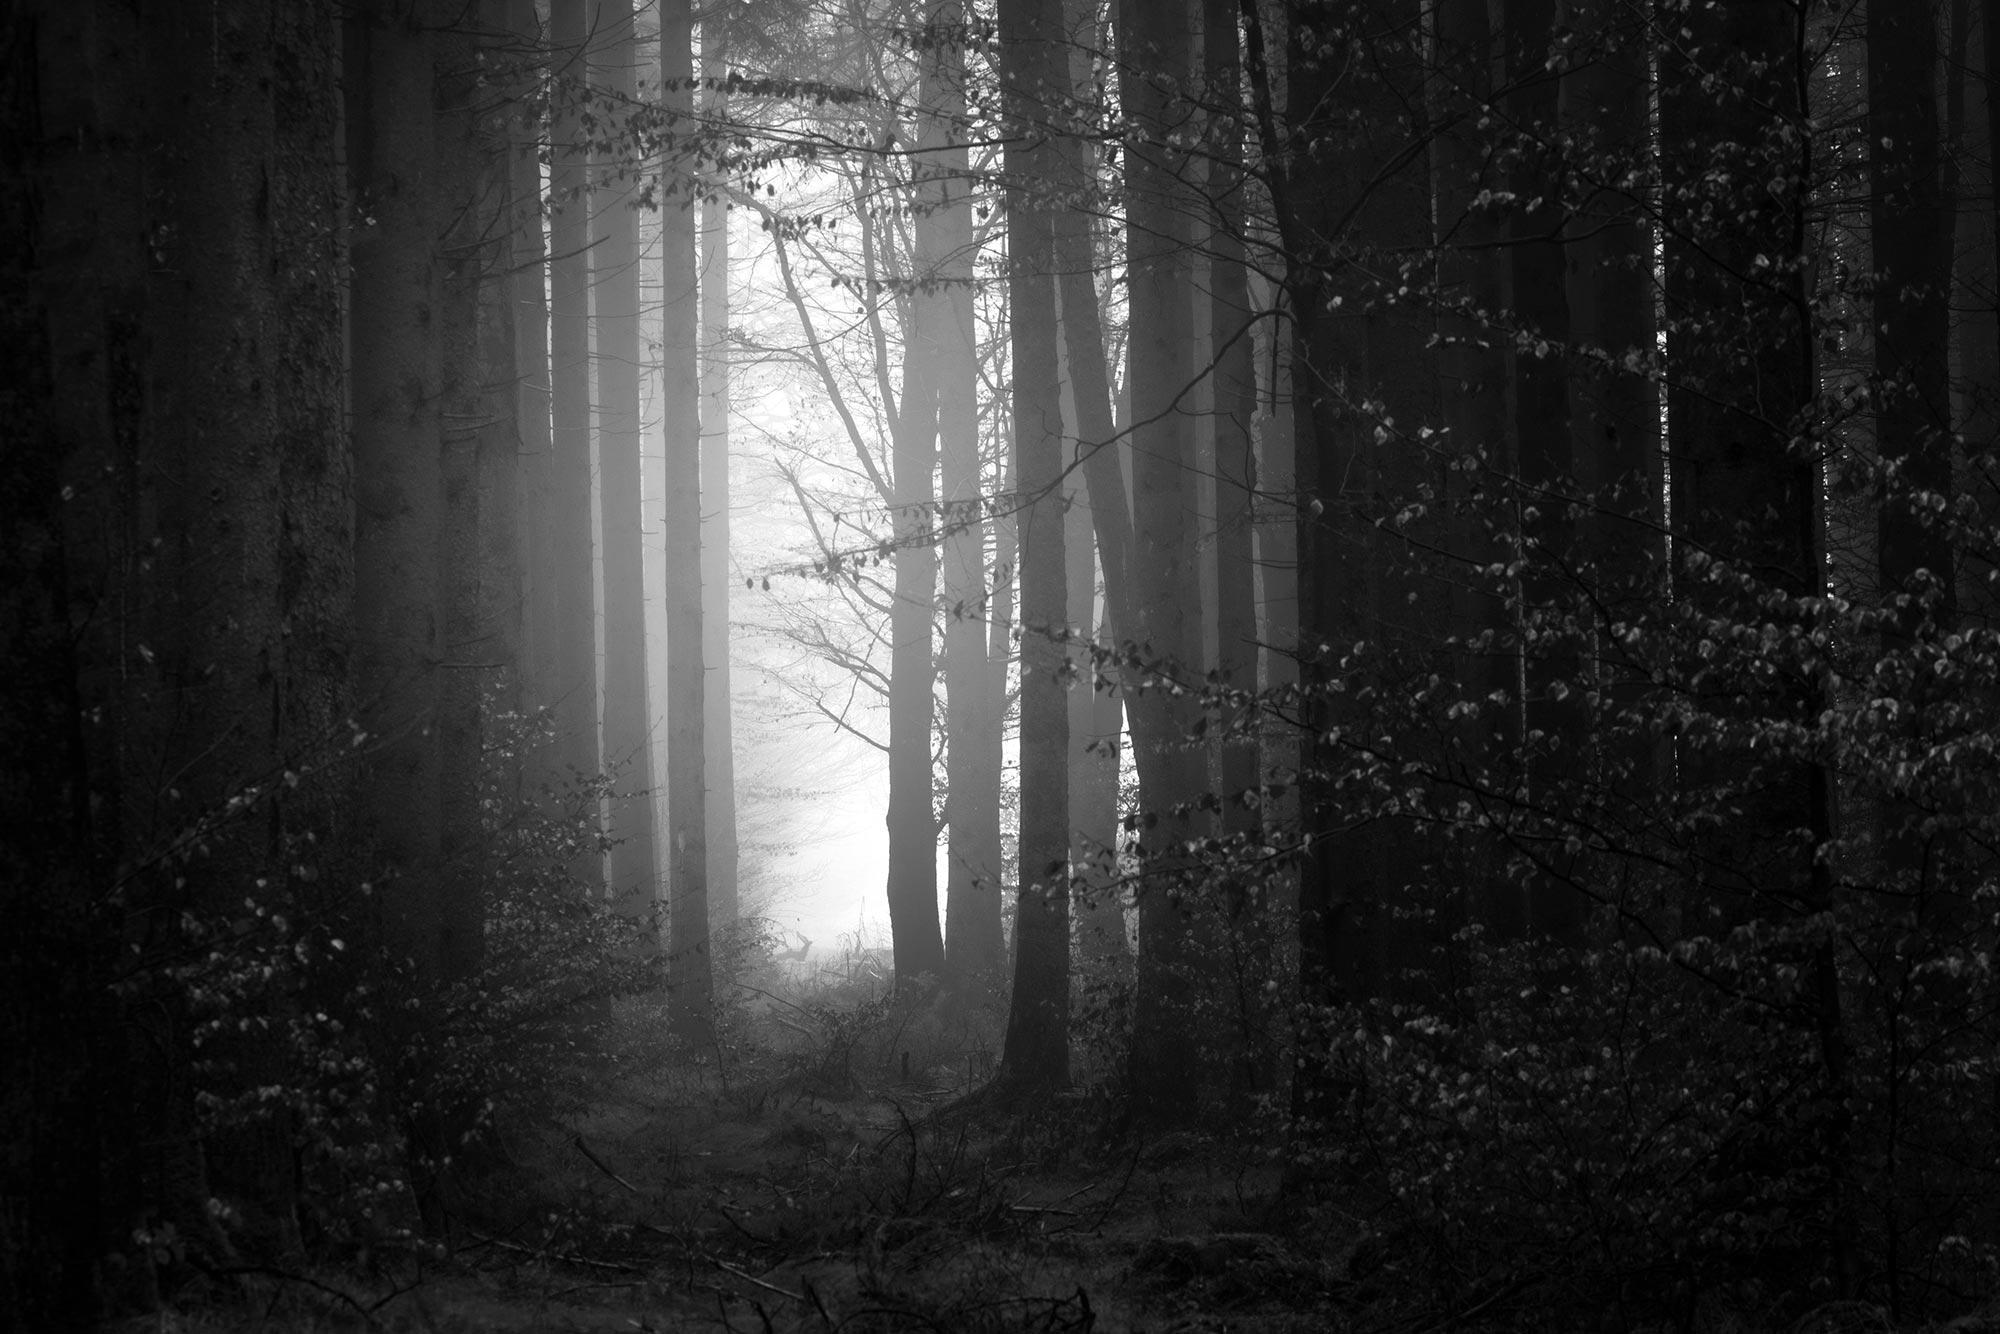 https://www.kobedigital.com/wp-content/uploads/2020/12/ServicesStudios_OurApproach_Trees_01.jpg